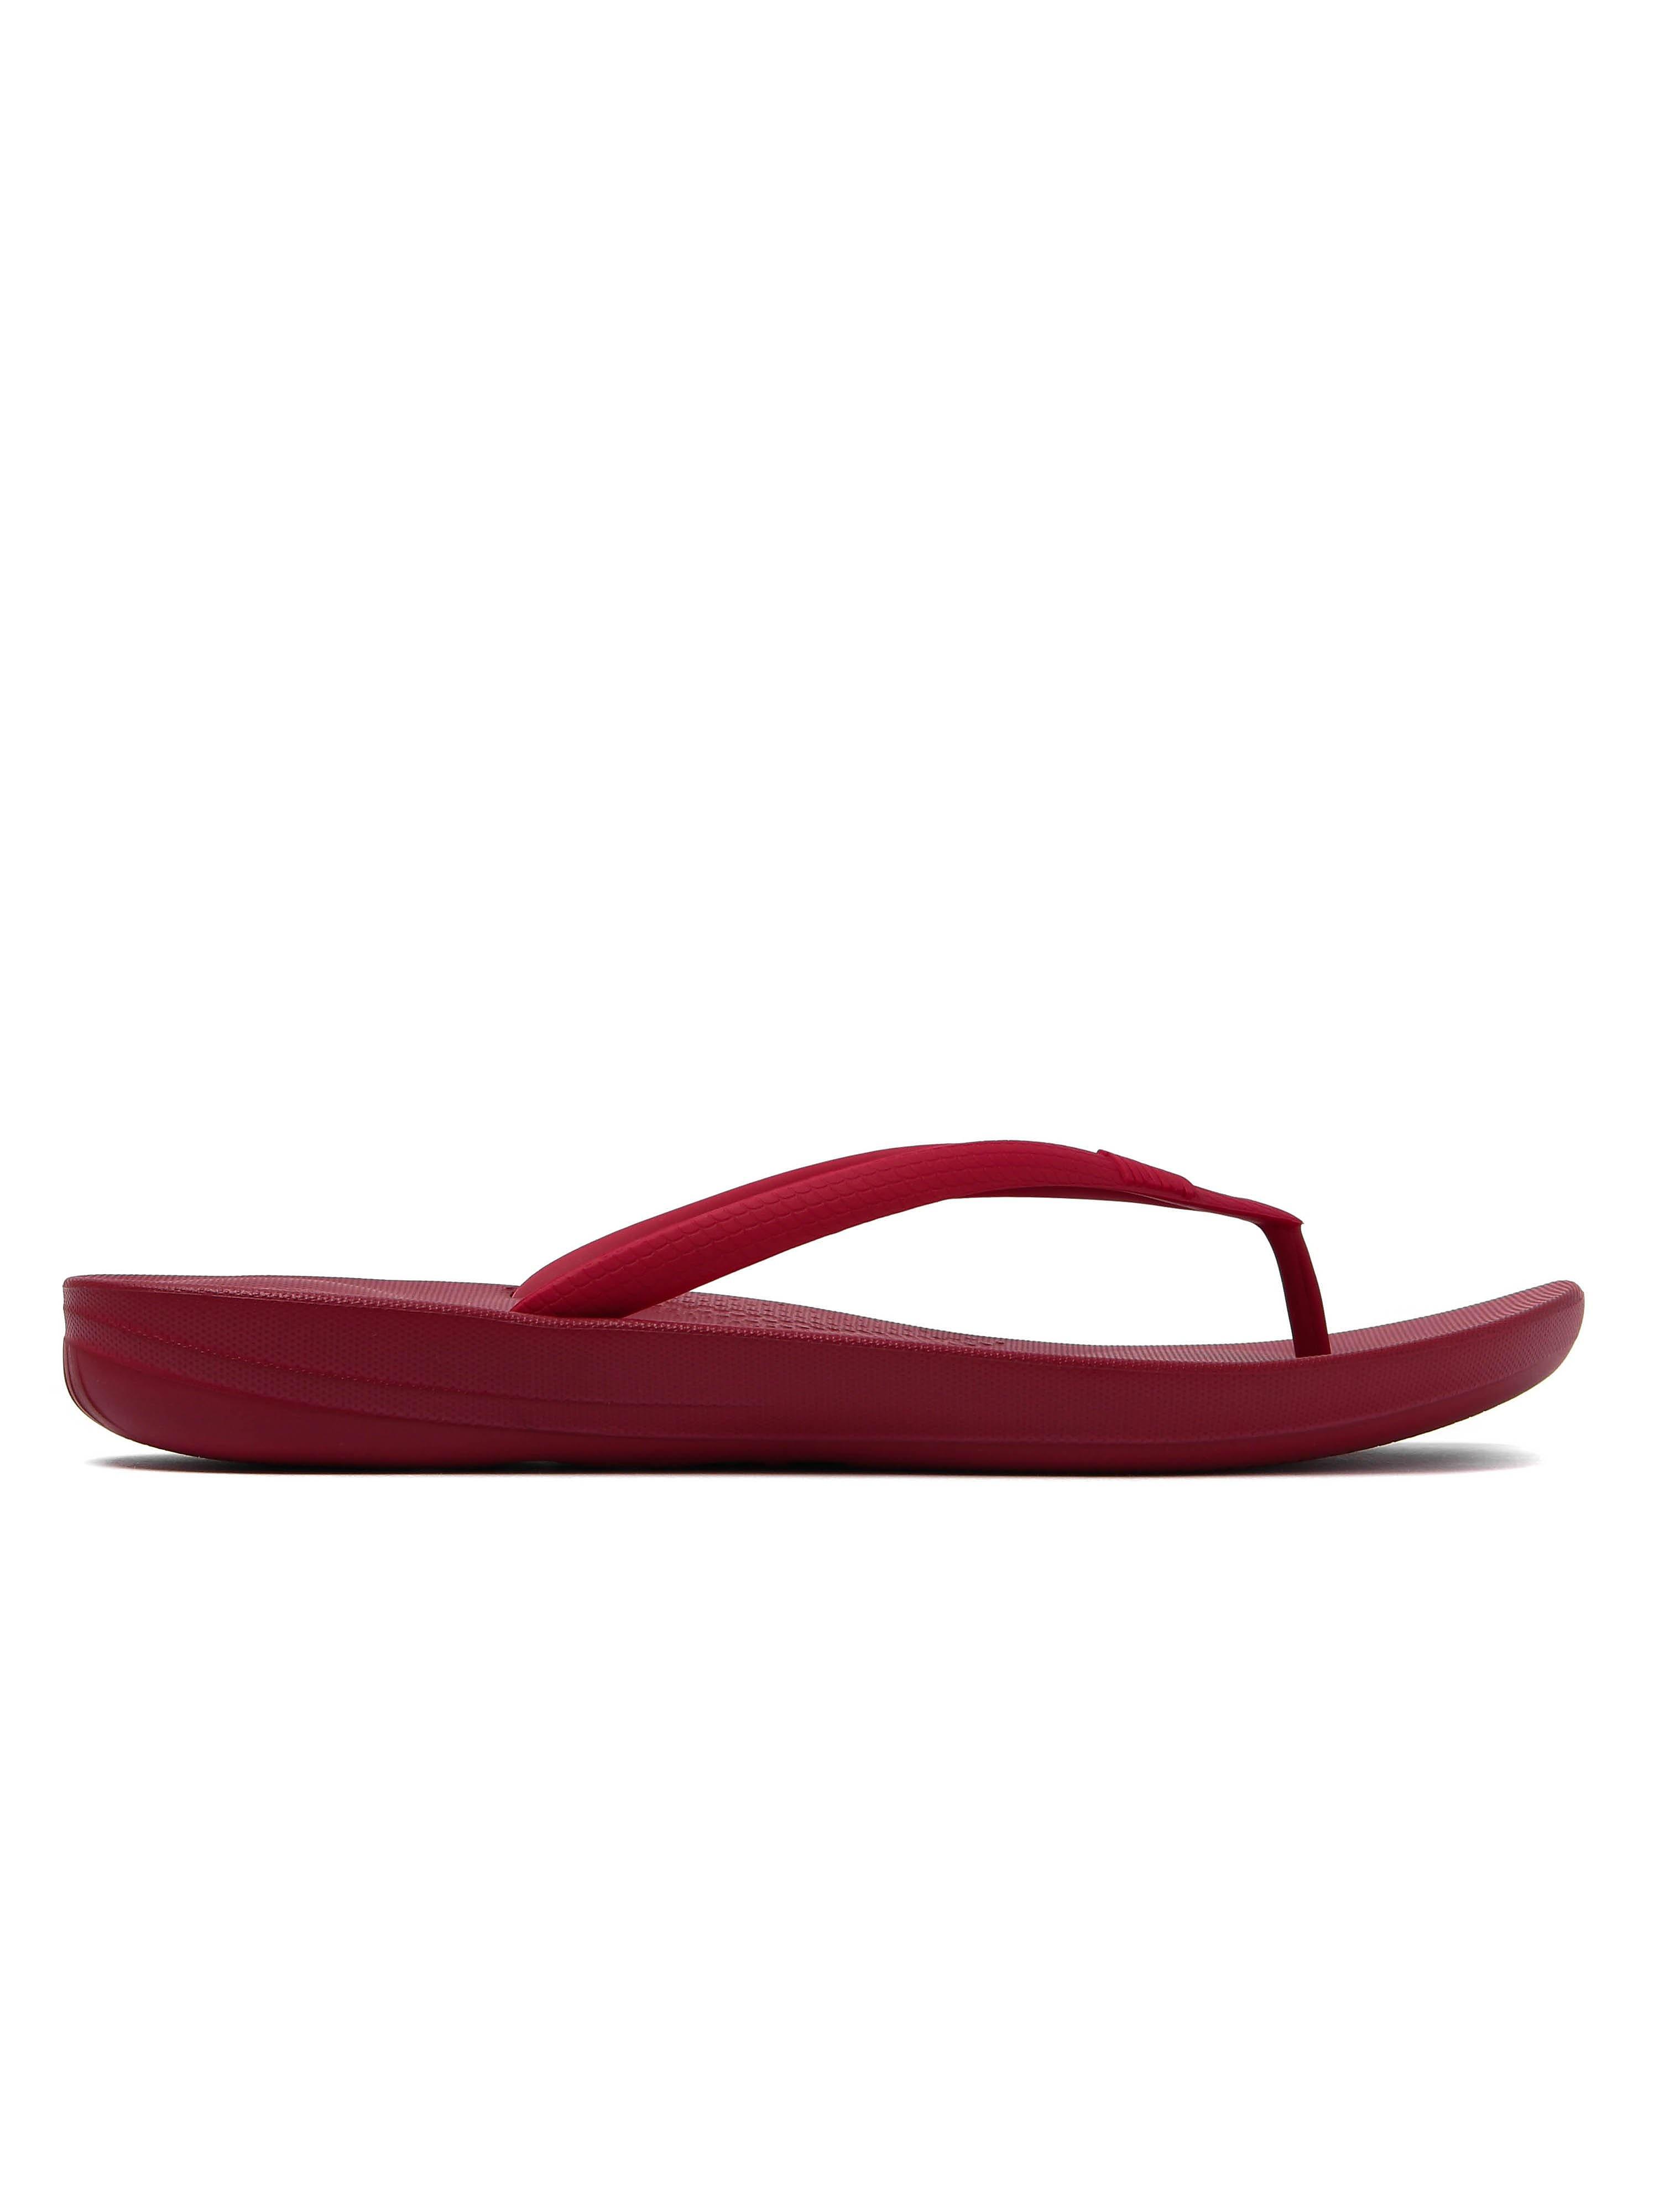 FitFlop Women's IQushion Ergonomic Flip Flops - Classic Red